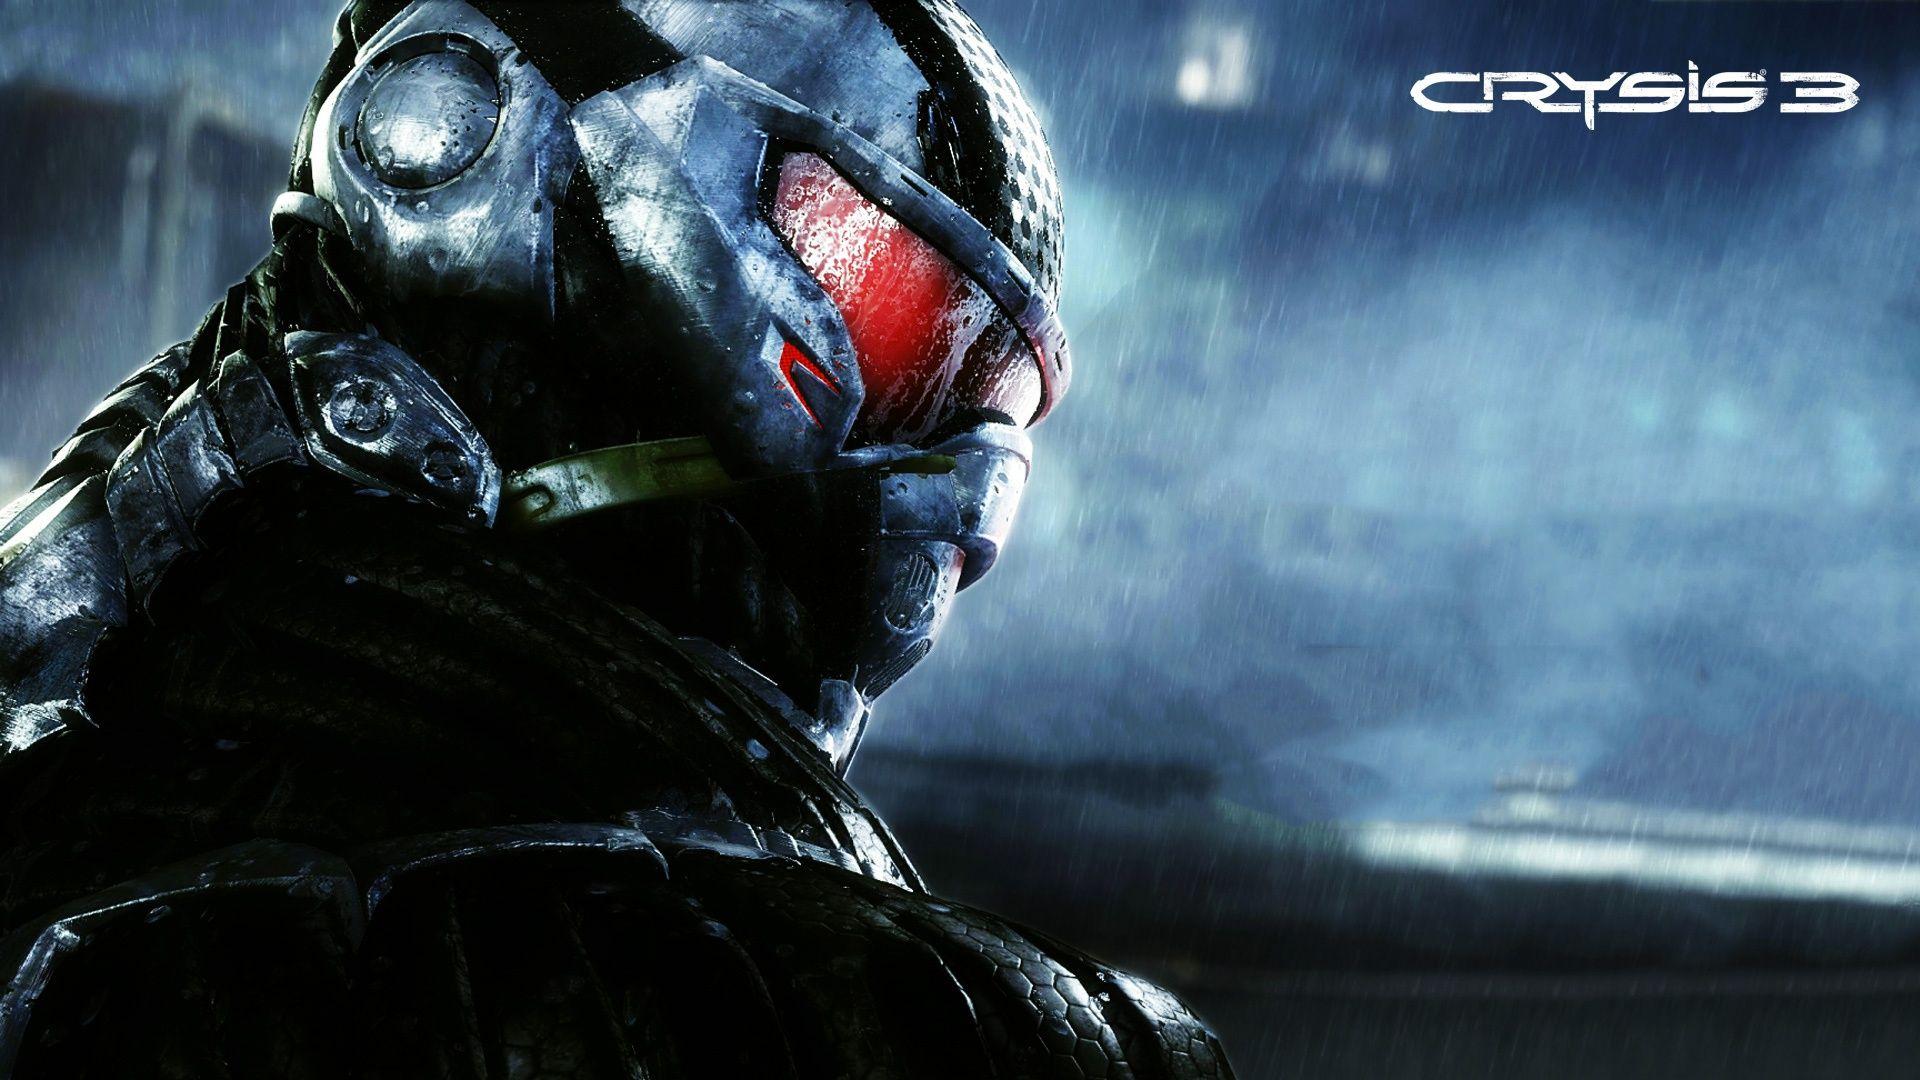 Crysis 3 The Nanosuit 1080p Hd Wallpaper Games Action Wallpaper Widescreen Wallpaper Gaming Wallpapers